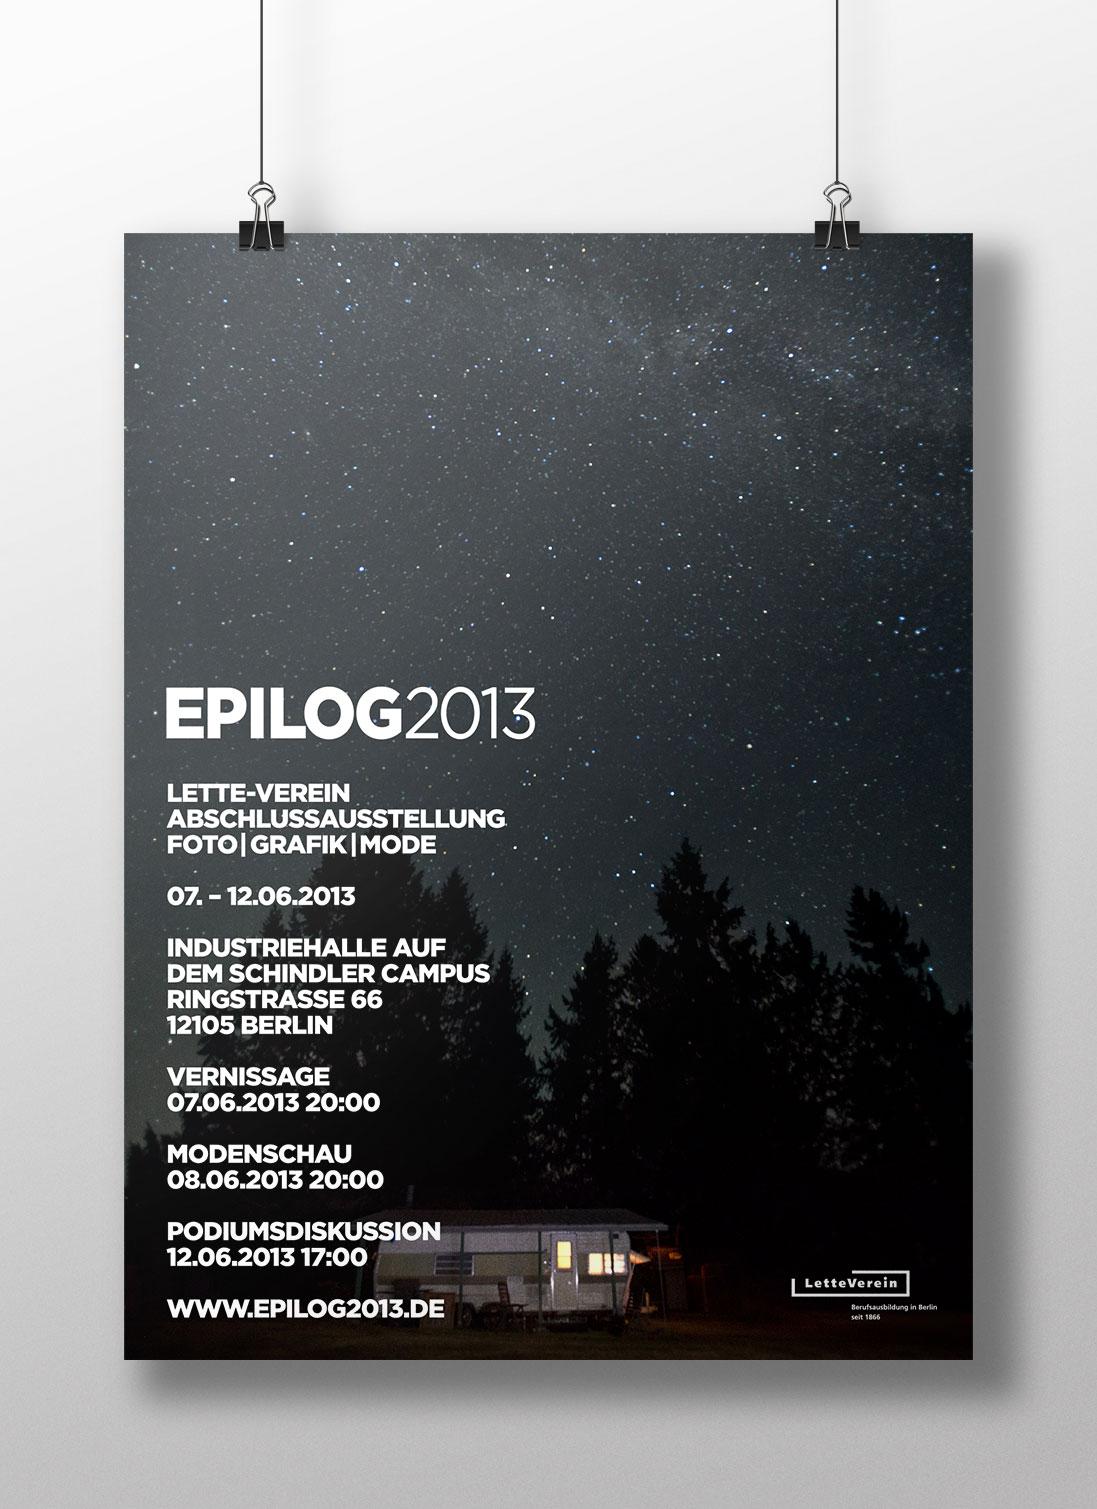 Poster-EPILOG-FOTO_Mockup